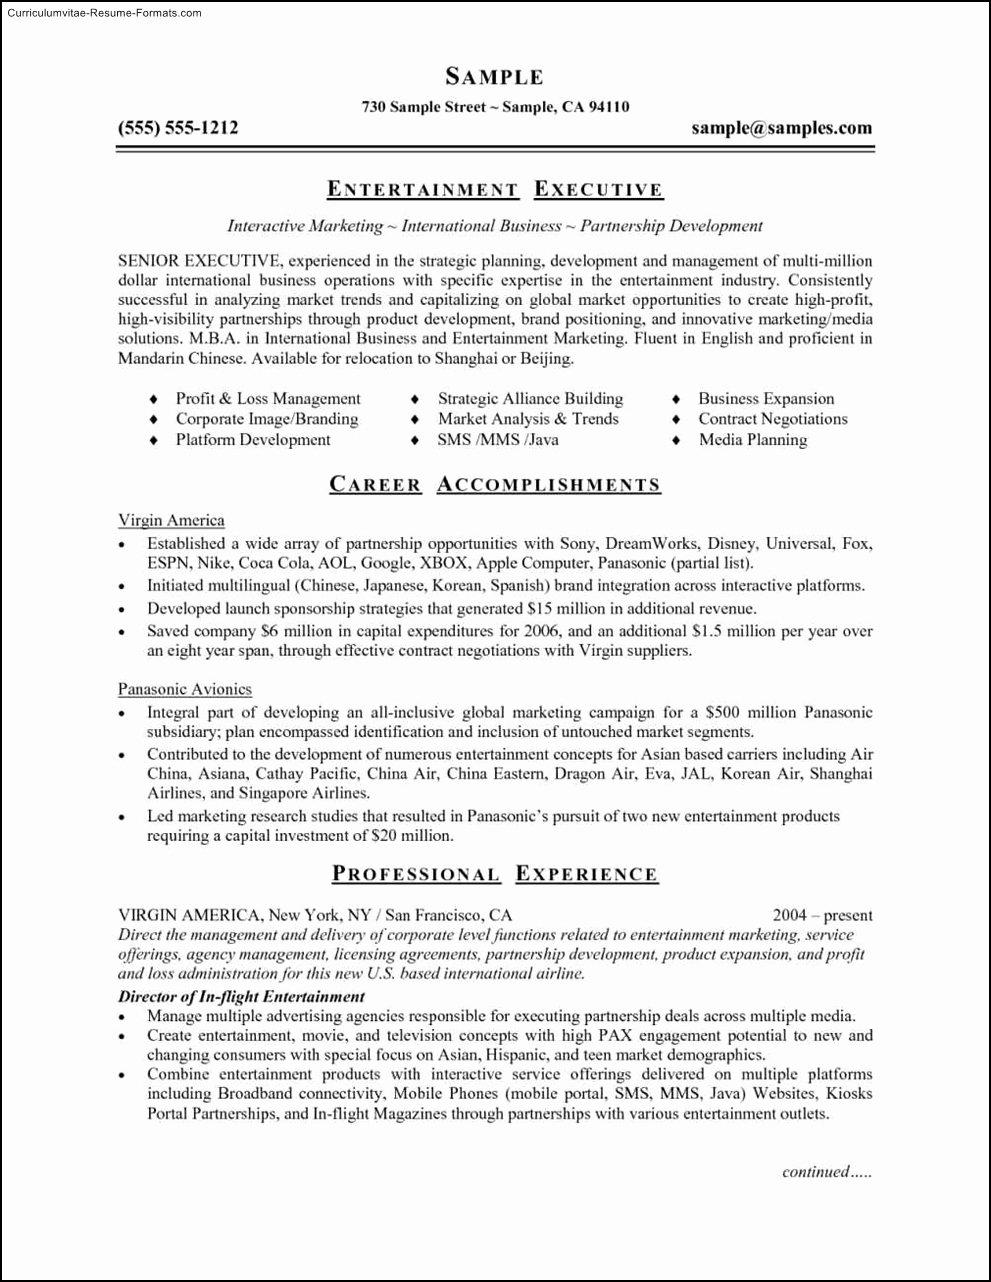 Microsoft Word 2003 Resume Template Free Download Free